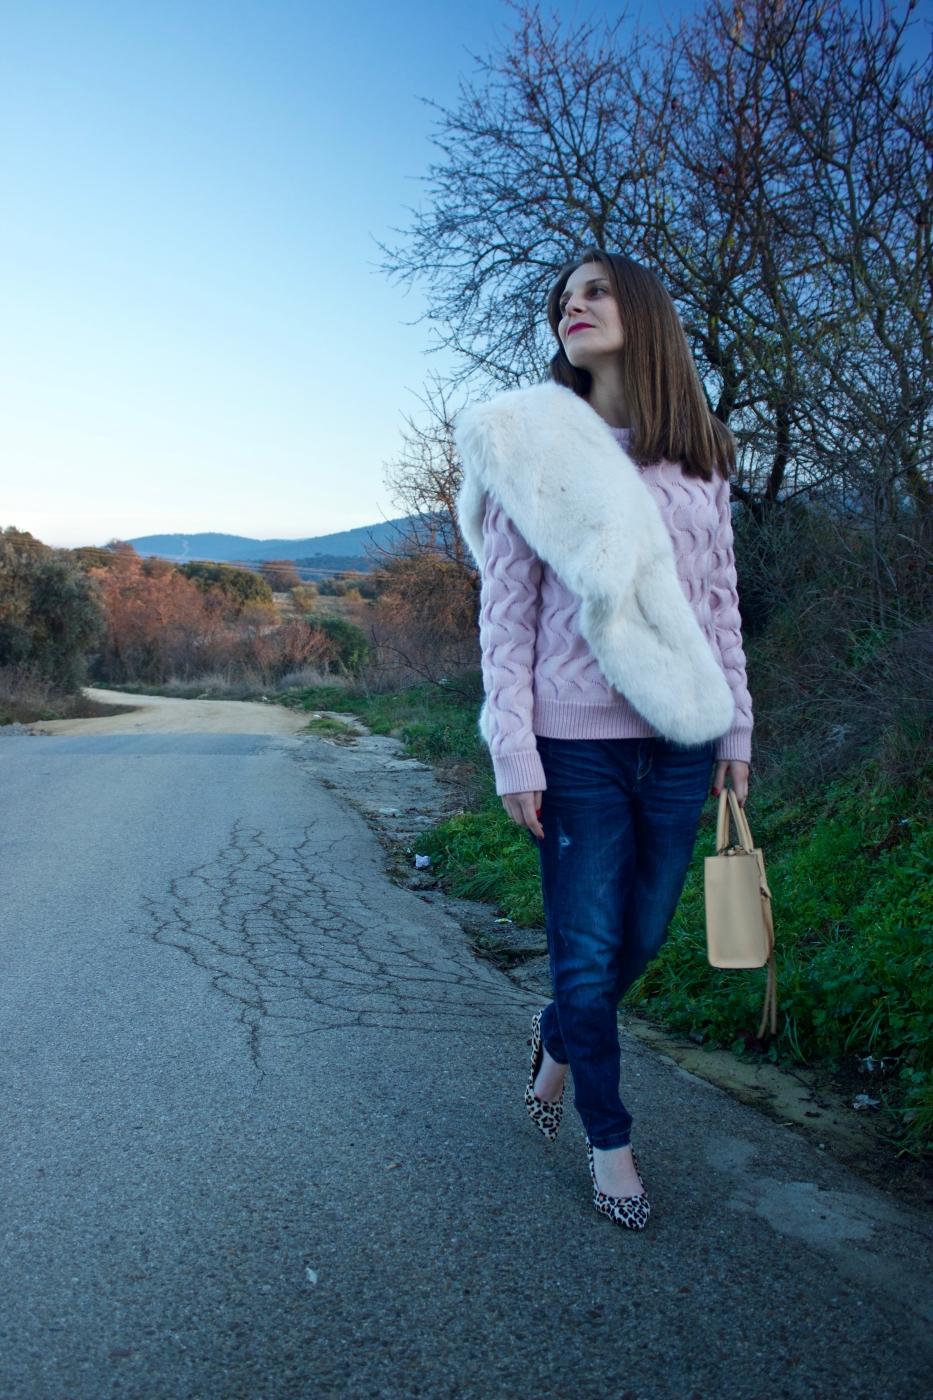 lara-vazquez-mad-lula-style-fashion-blog-moda-streetstyle-look-chic-jeans-heels-leopard